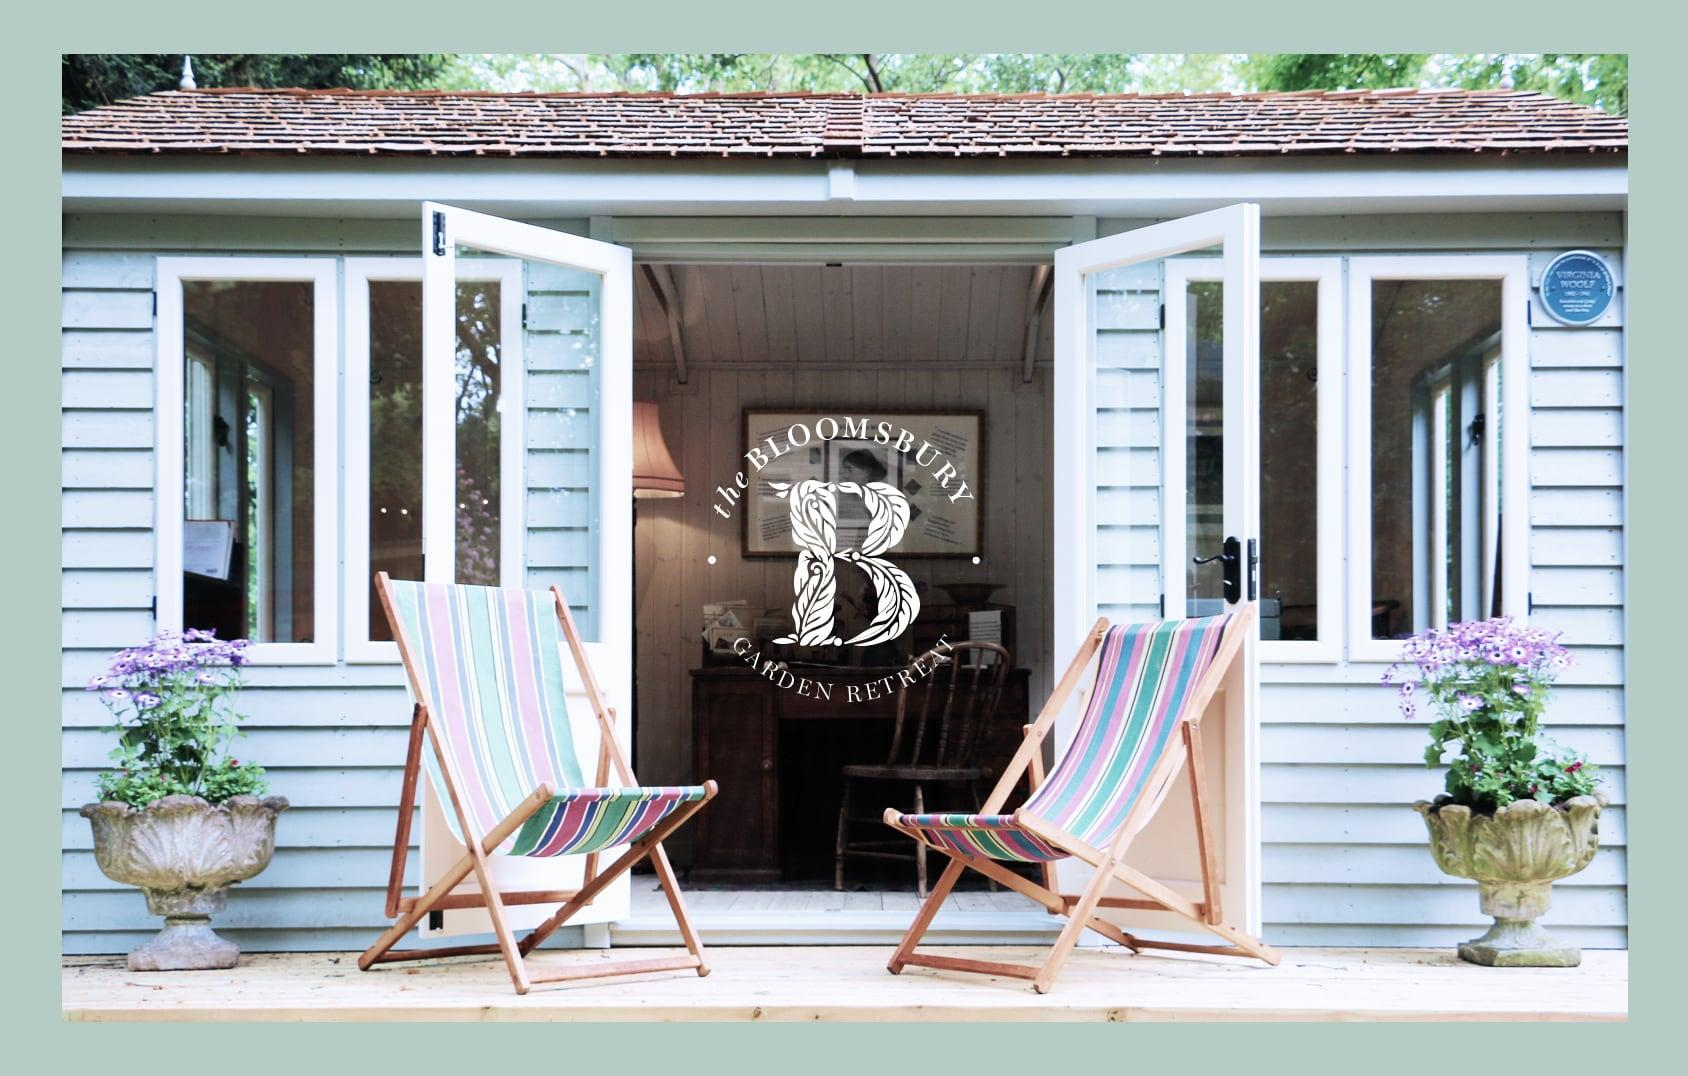 The Bloomsbury writing retreat, exclusive to Malvern Garden Buildings